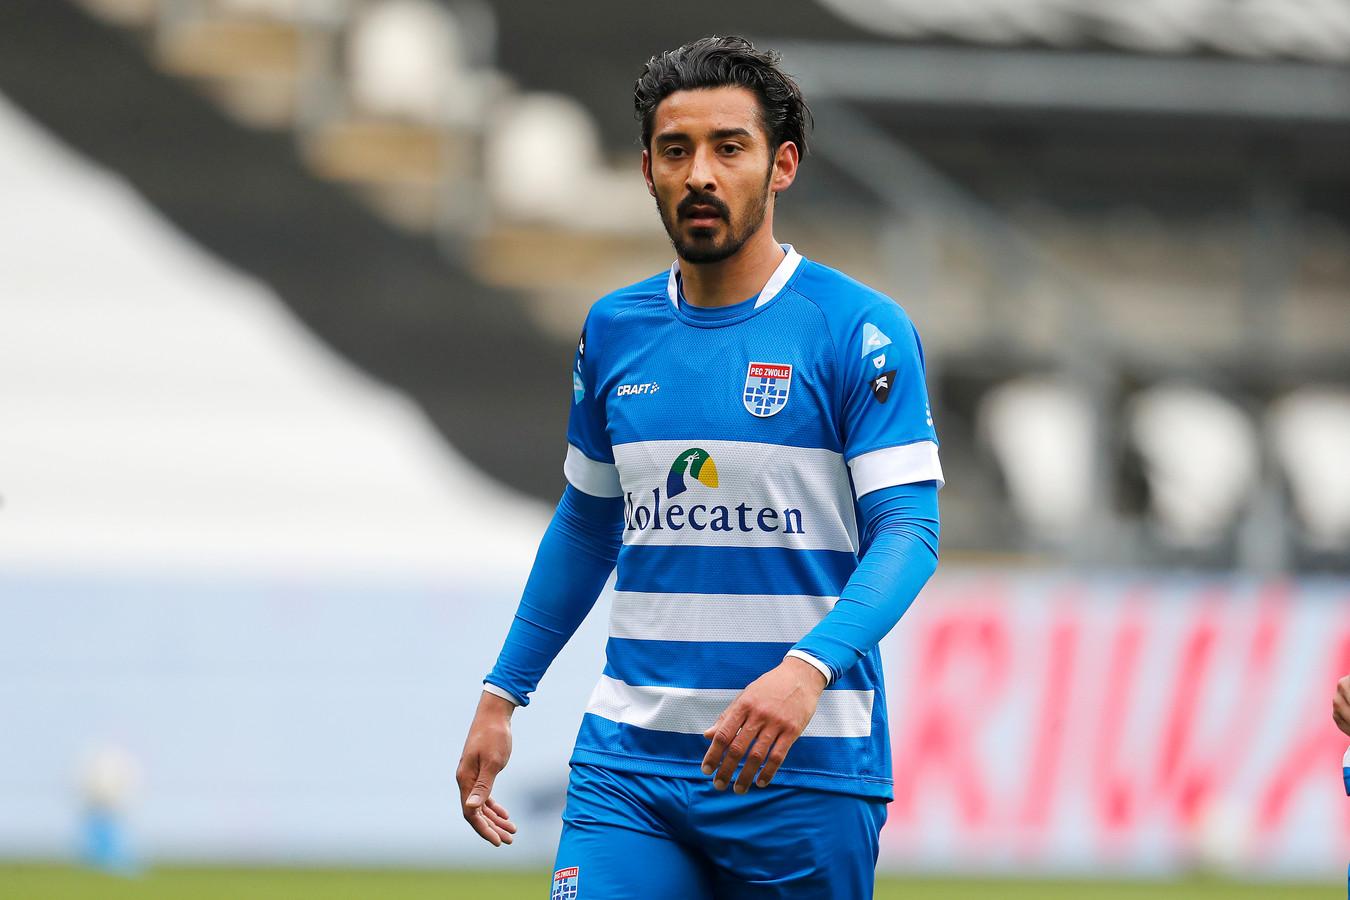 Reza Goochannejhad vertrekt na twee seizoenen bij Zwolle.